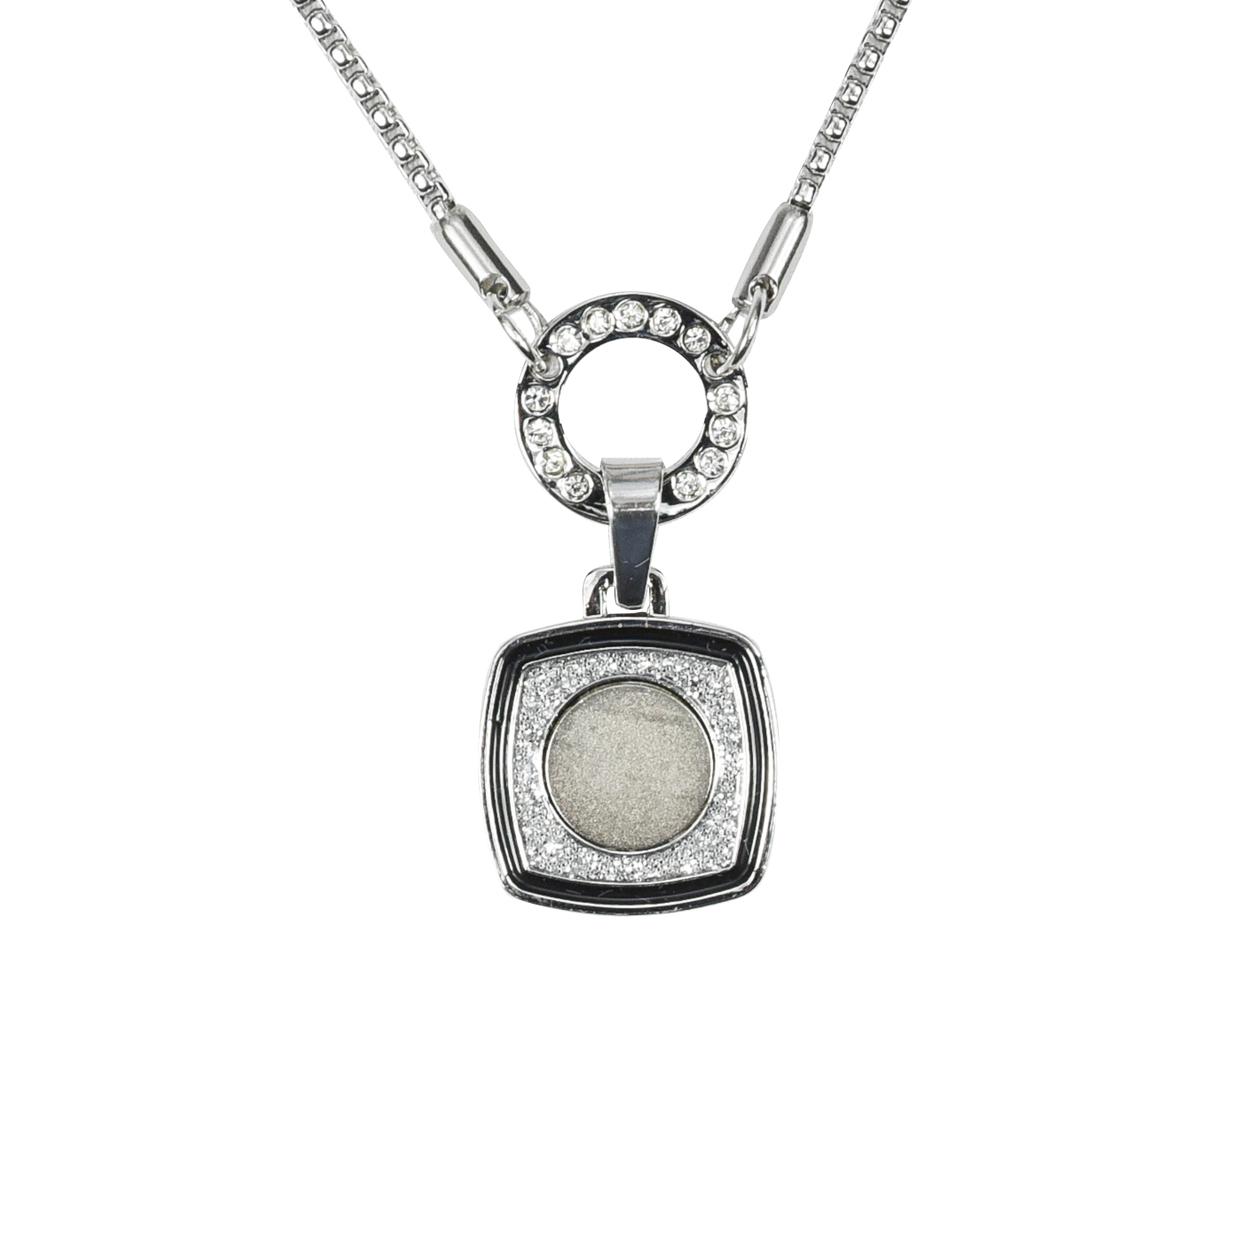 256. Glitzy Magnetic  Allure Necklace